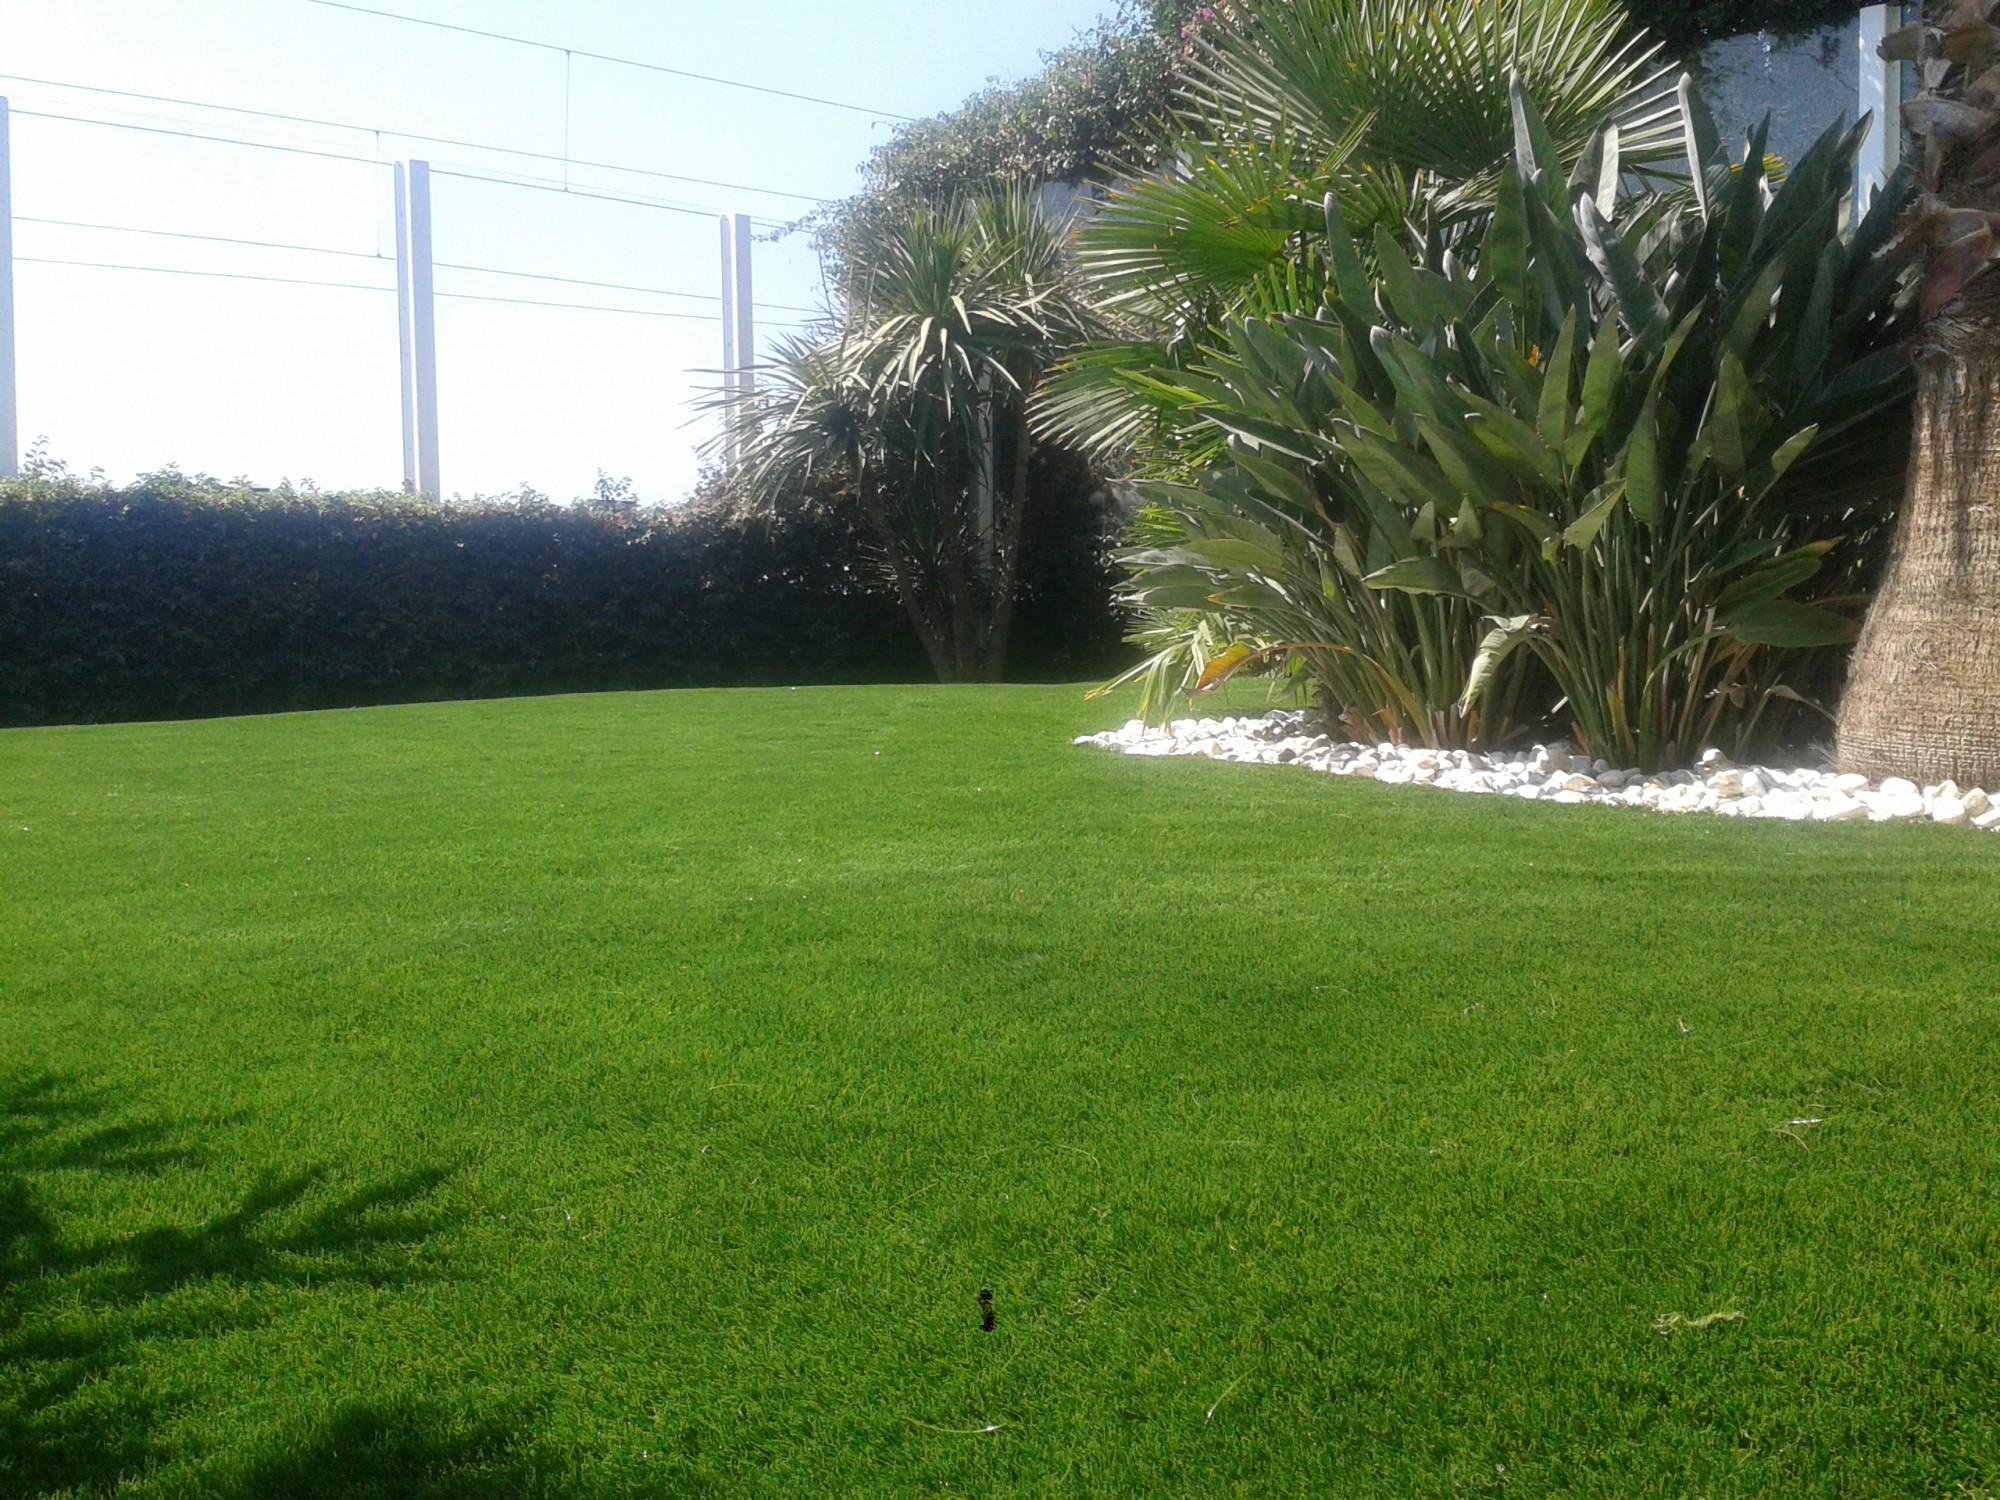 pose de 260 m de gazon synth tique jardin cannes en. Black Bedroom Furniture Sets. Home Design Ideas